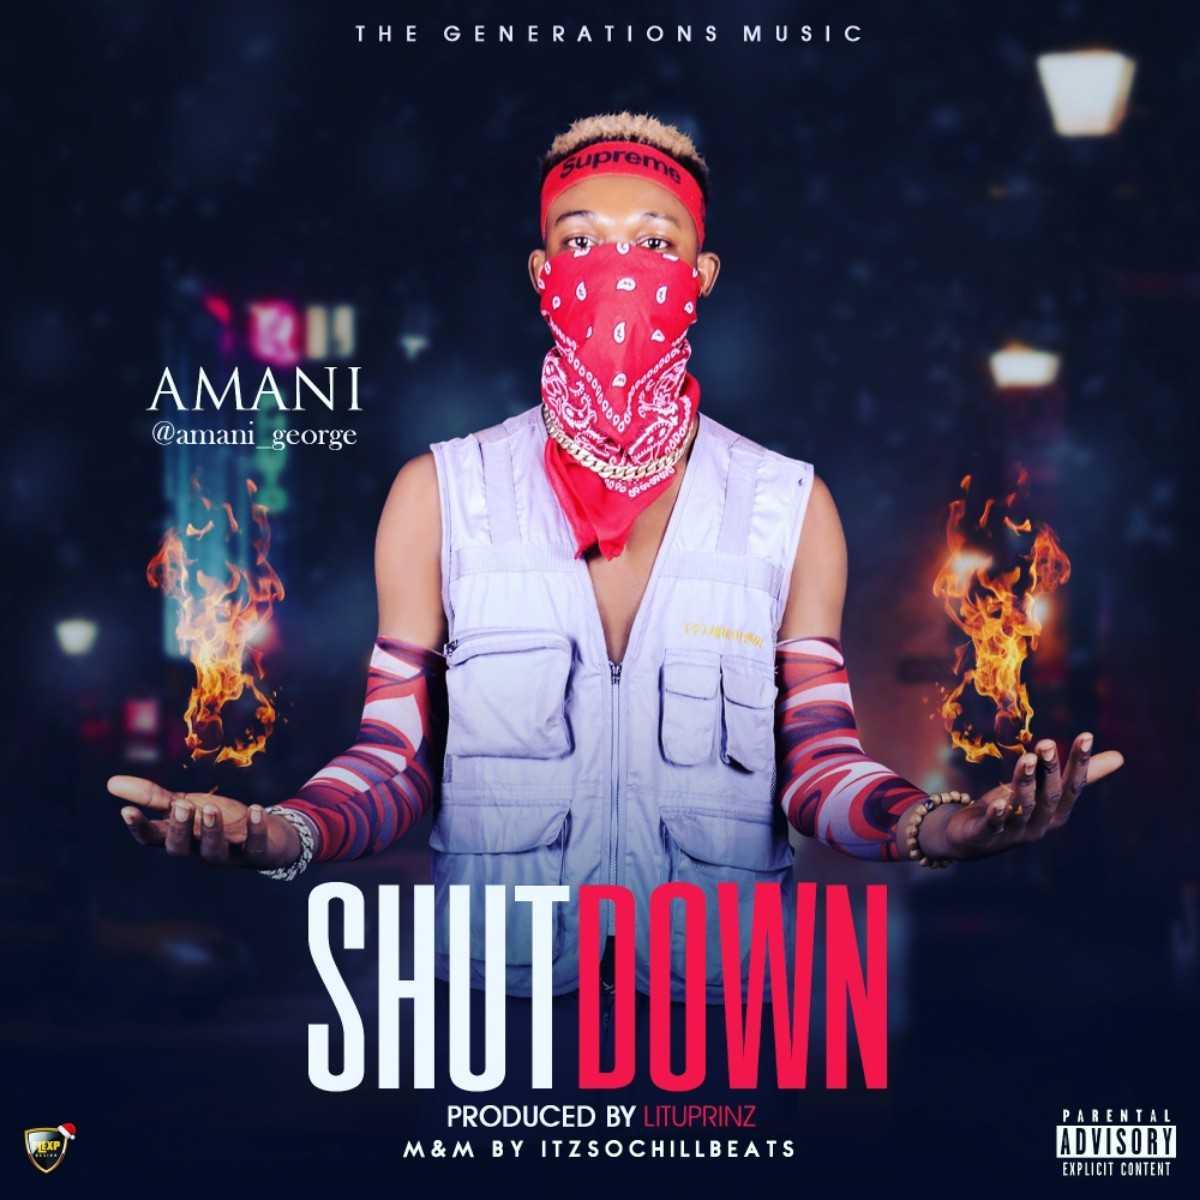 (MUSIC/AUDIO): Amani – Shutdown(Prod. By Lituprinz)